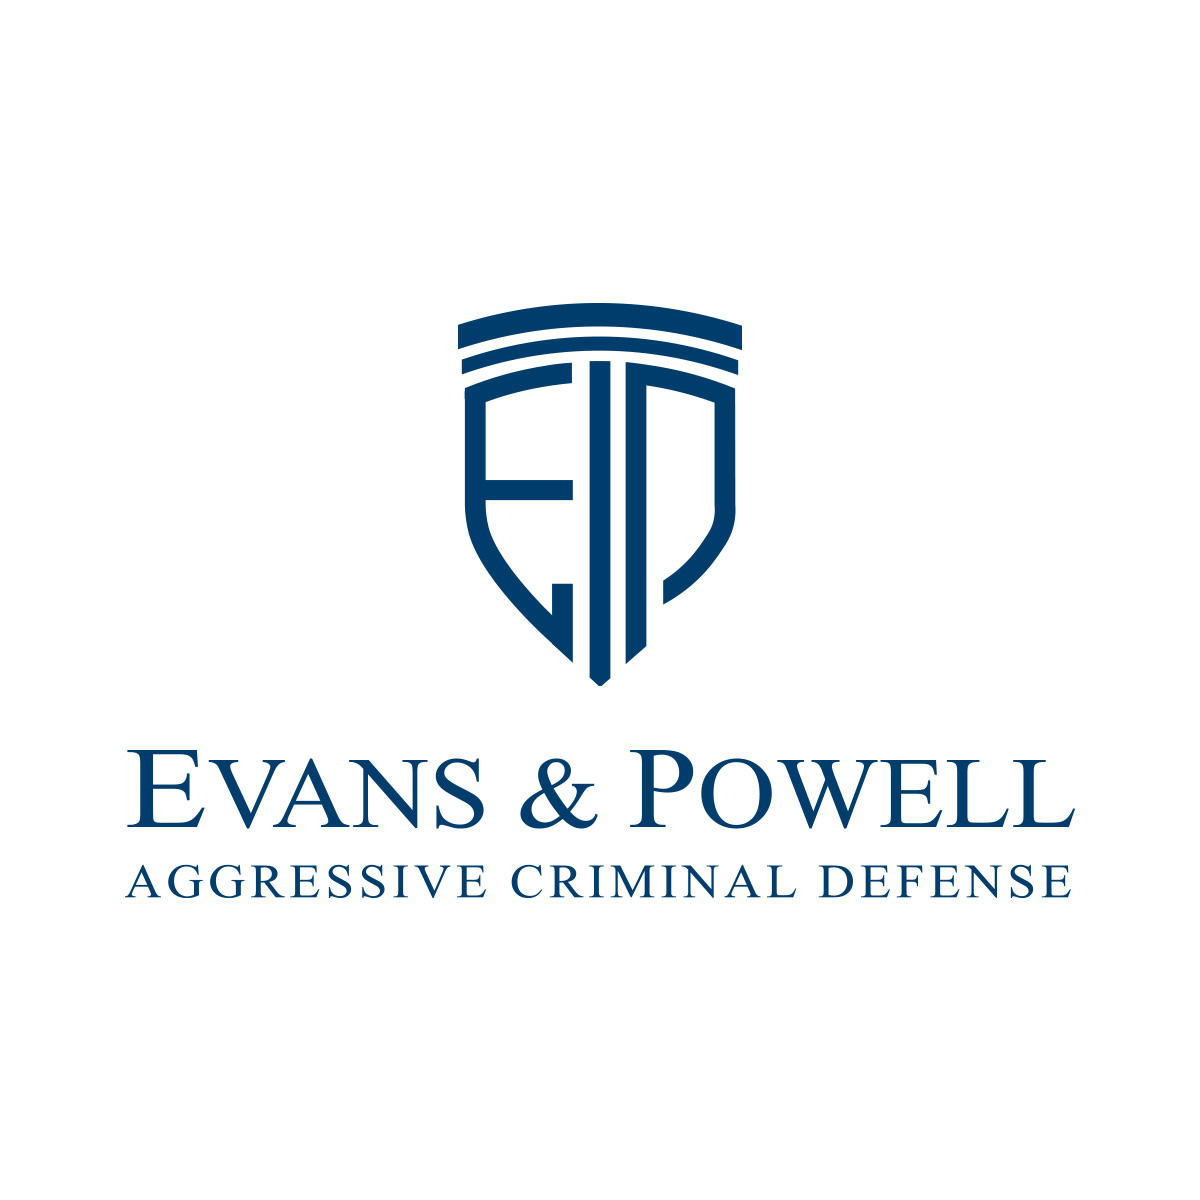 Evans & Powell, PLLC